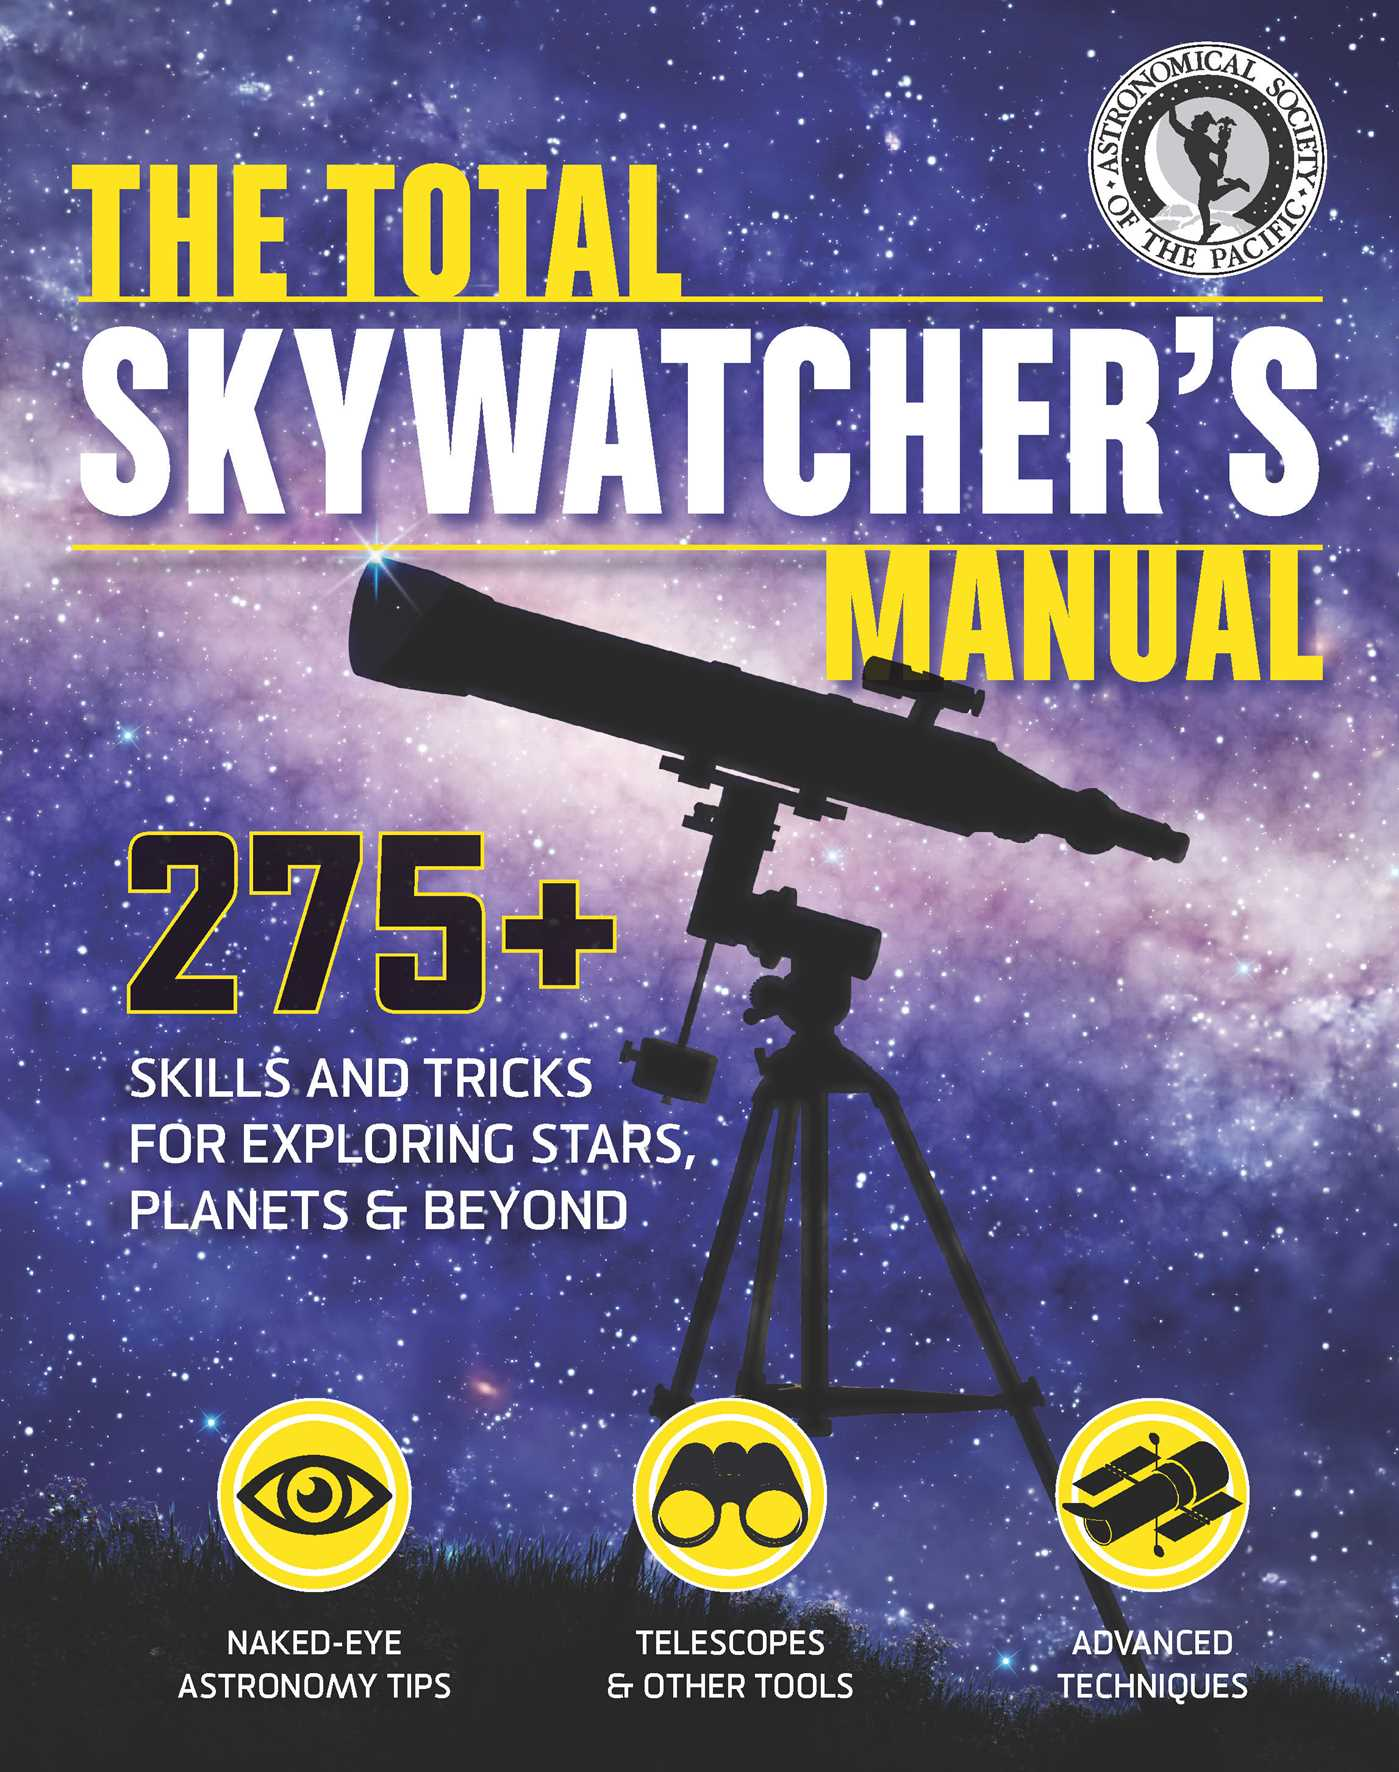 total skywatcher's manual.jpg